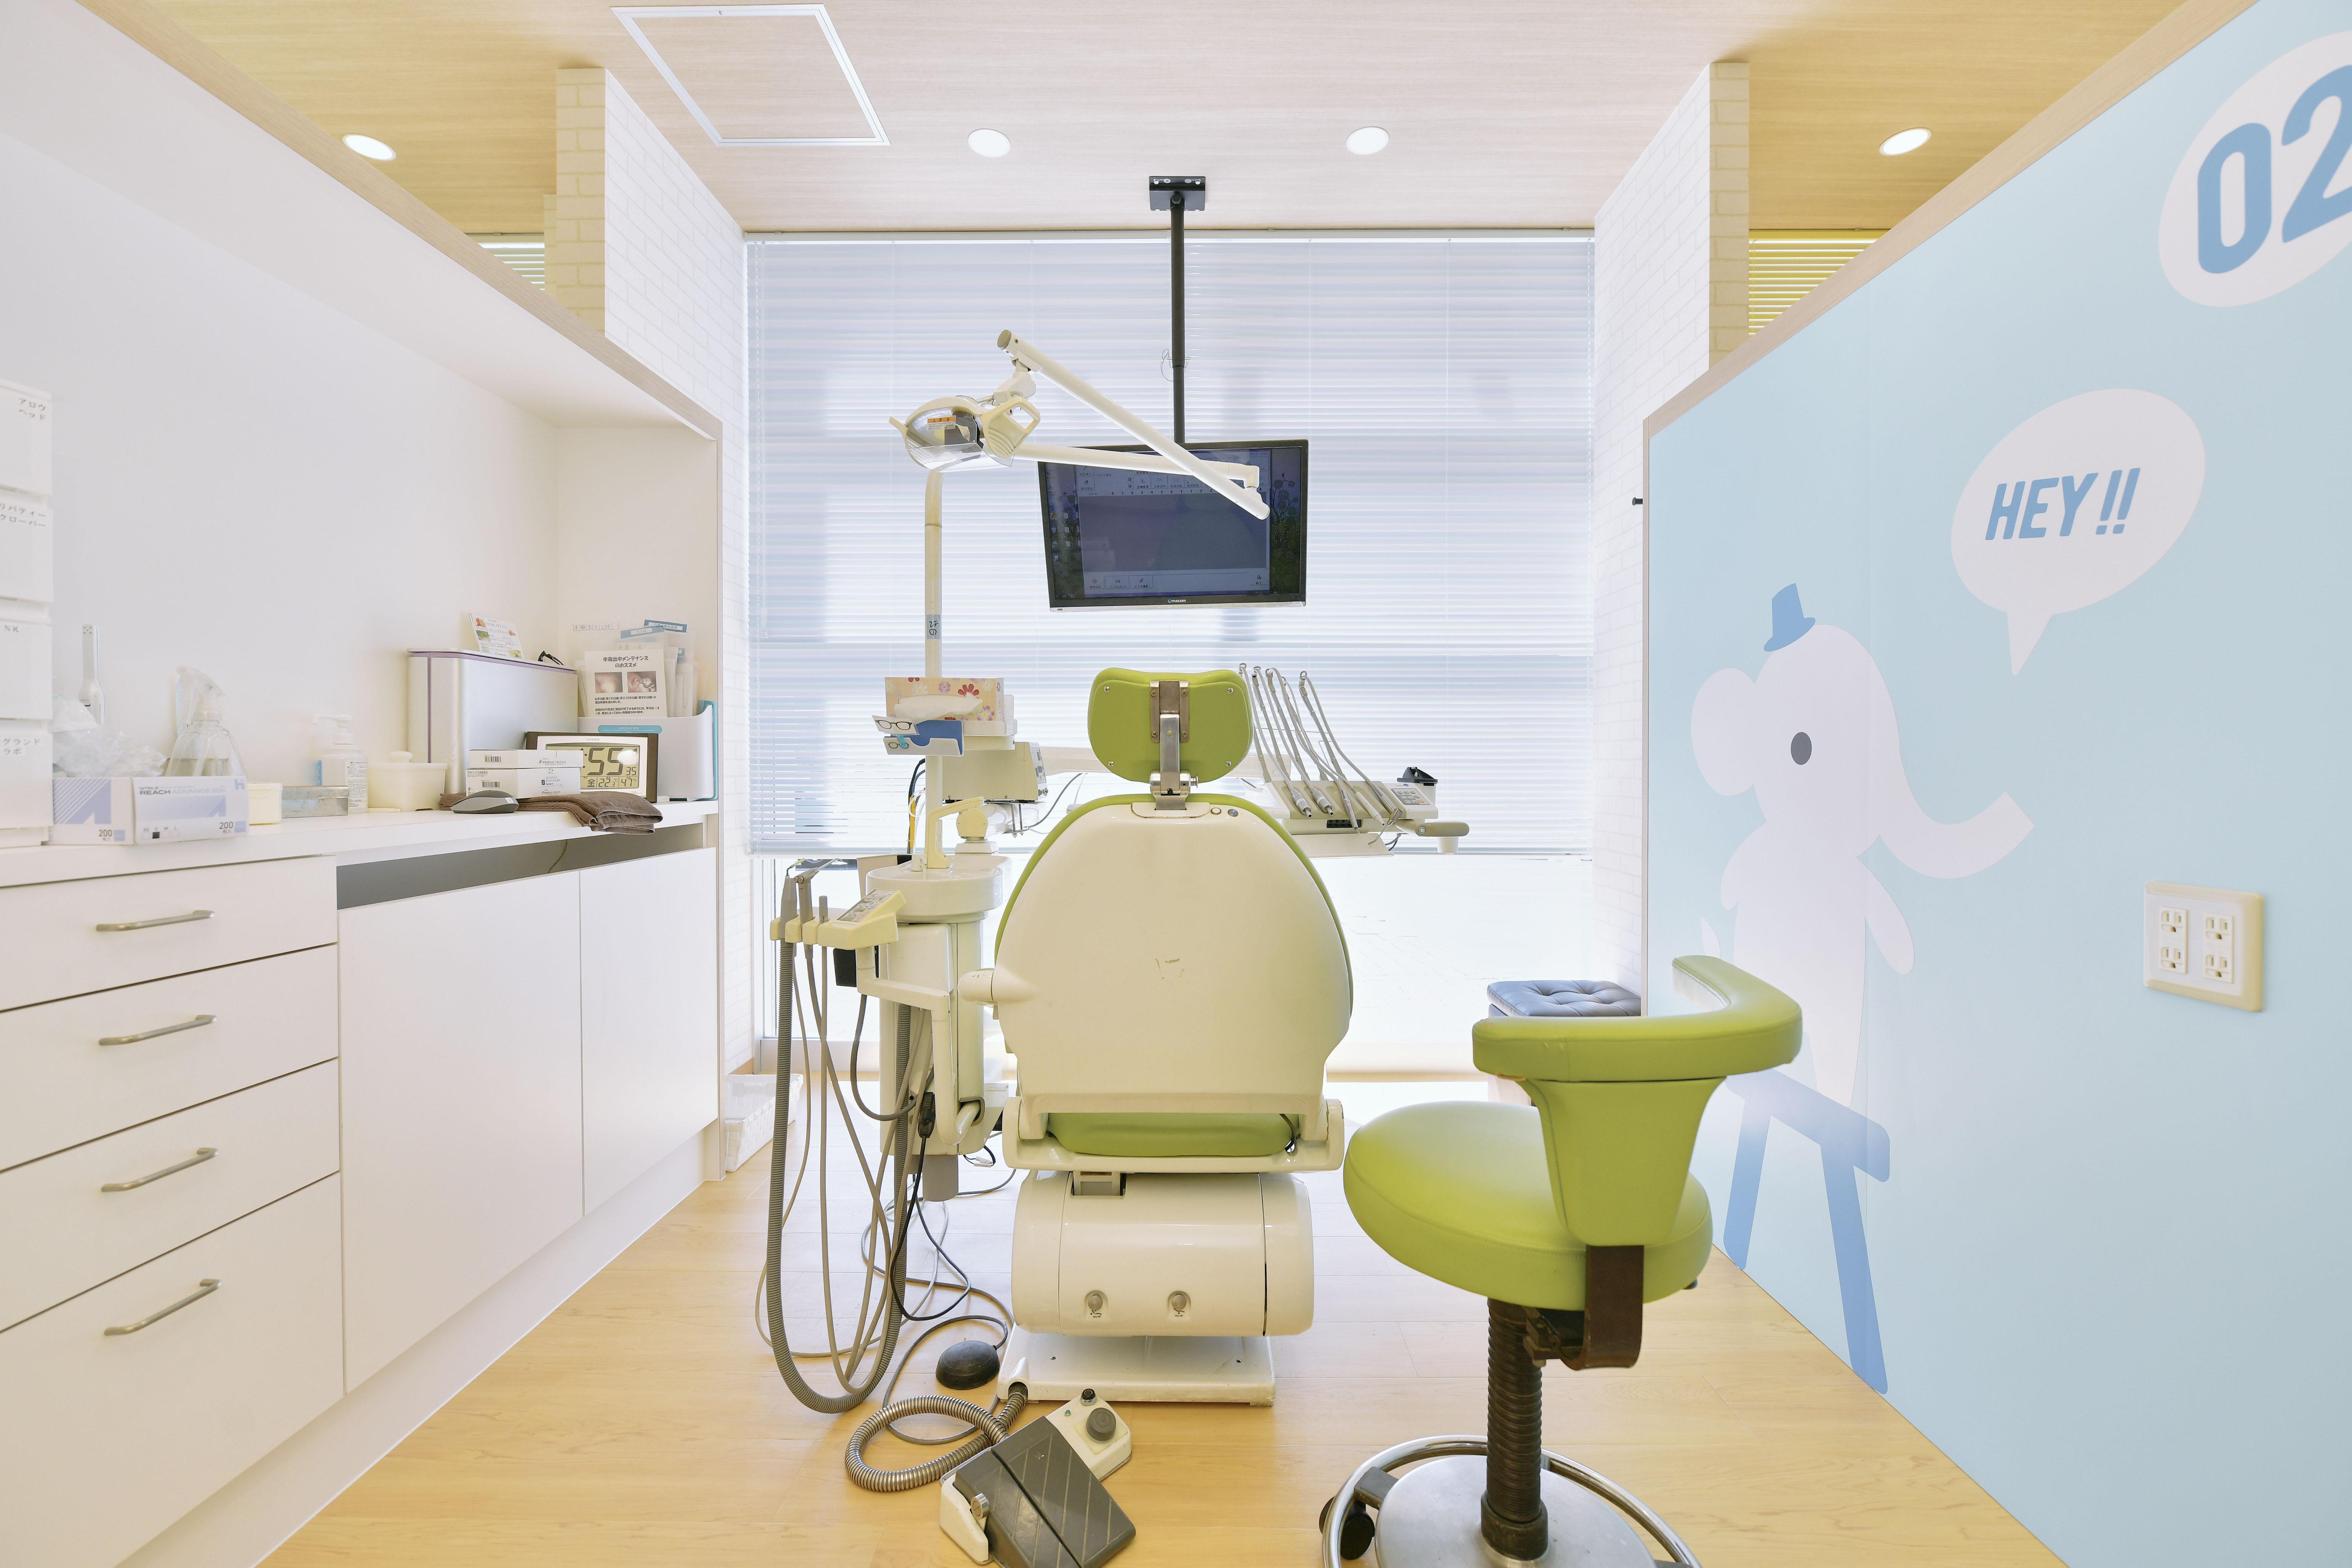 AOYAMA DENTAL OFFICE 小児歯科センターカムカムクラブ